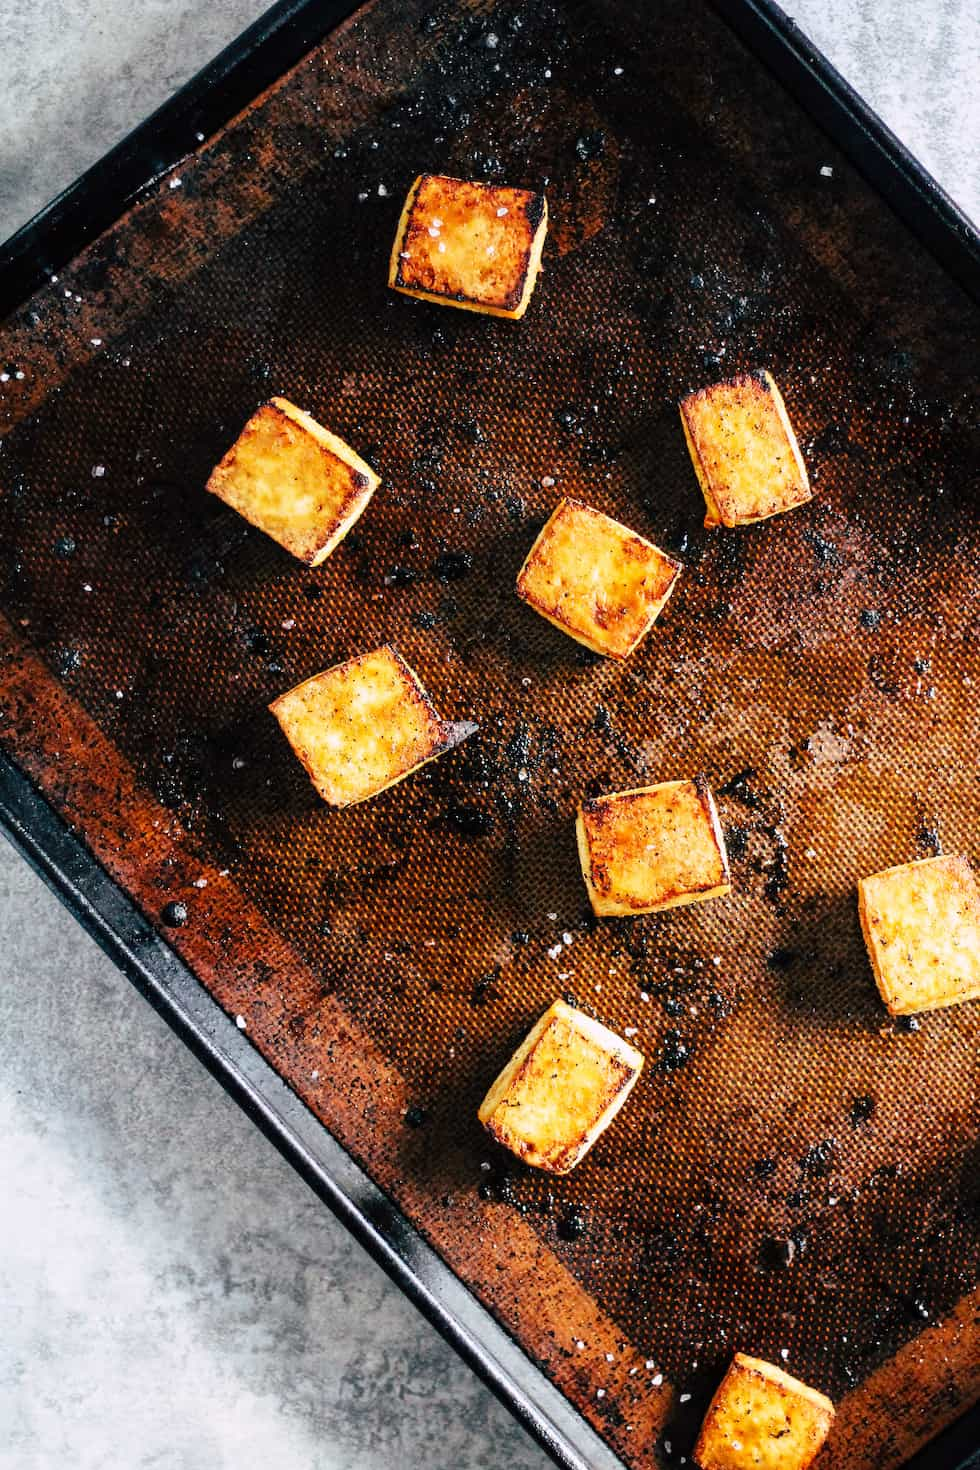 Crispy tofu on sheet pan against grey background.